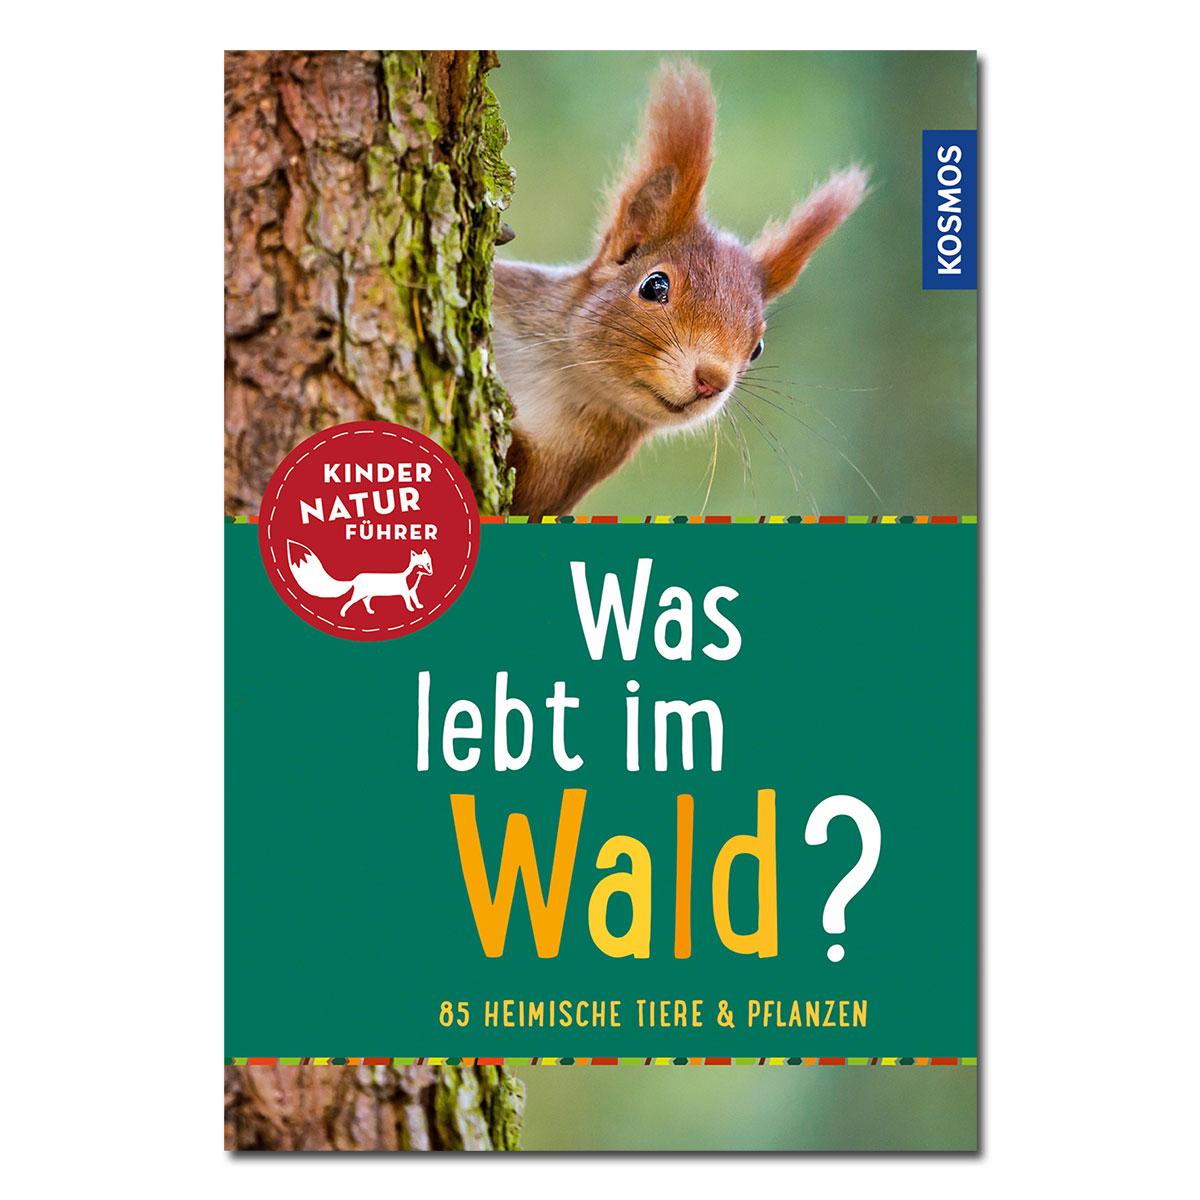 Kinder-Naturführer: Was lebt im Wald? im Pareyshop